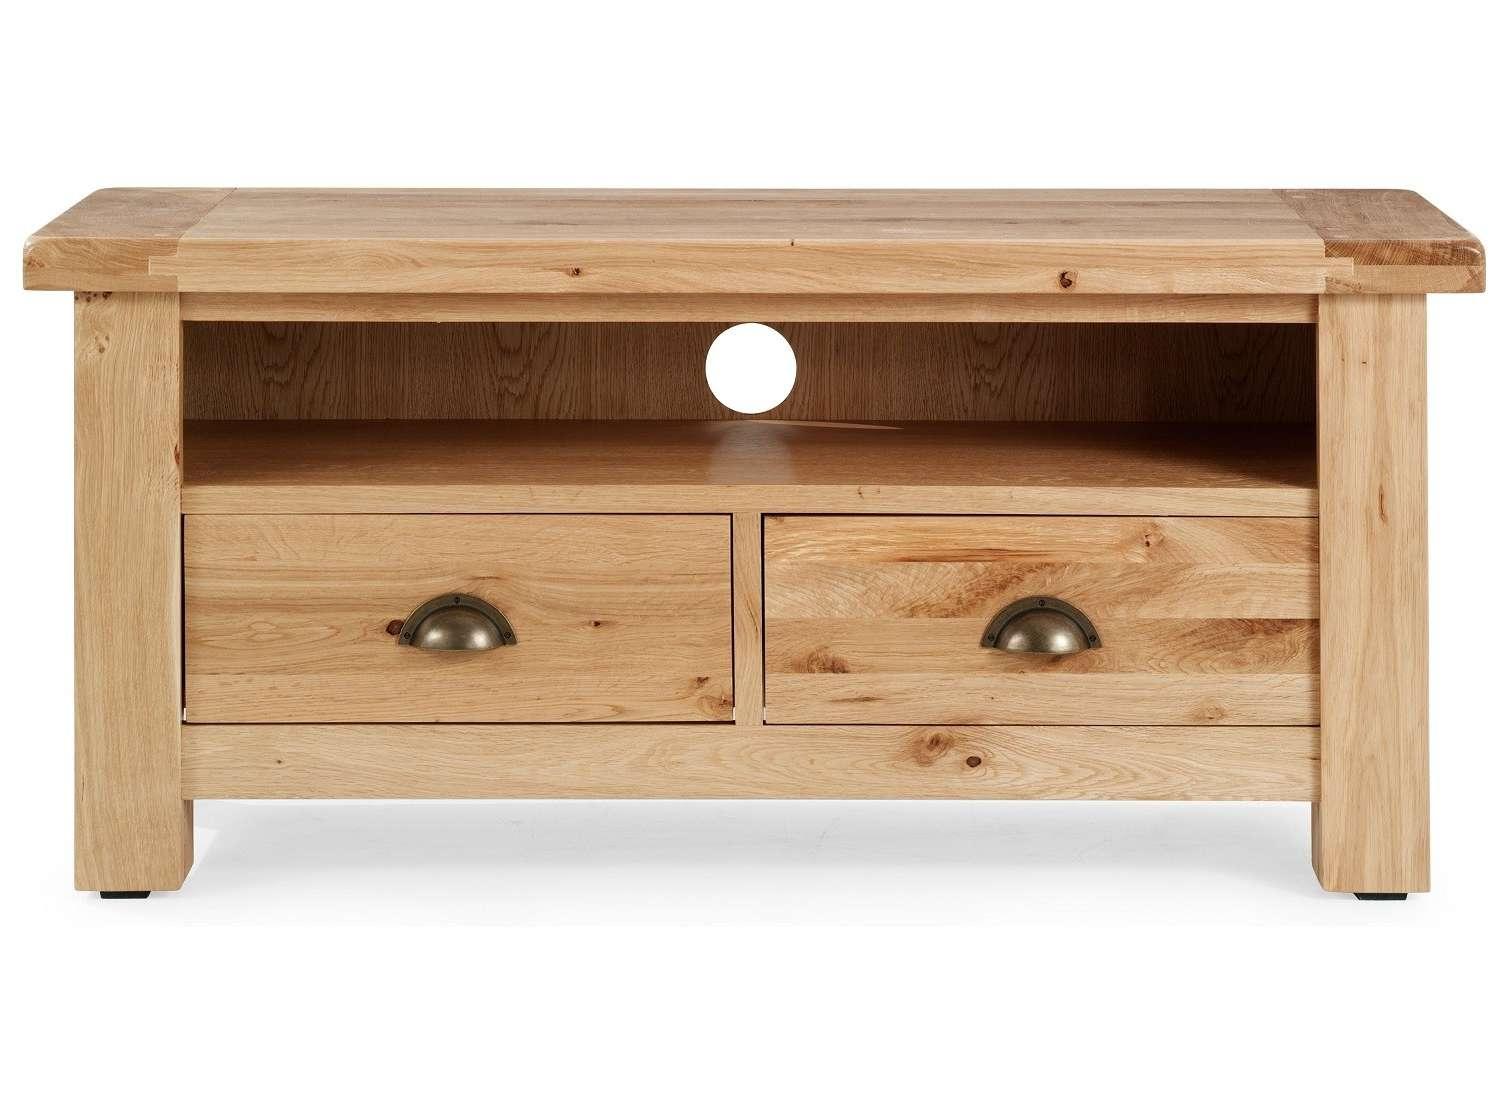 Normandy Rustic French Oak Tv Cabinet | Oak Furniture Uk Inside Oak Tv Cabinets (View 17 of 20)